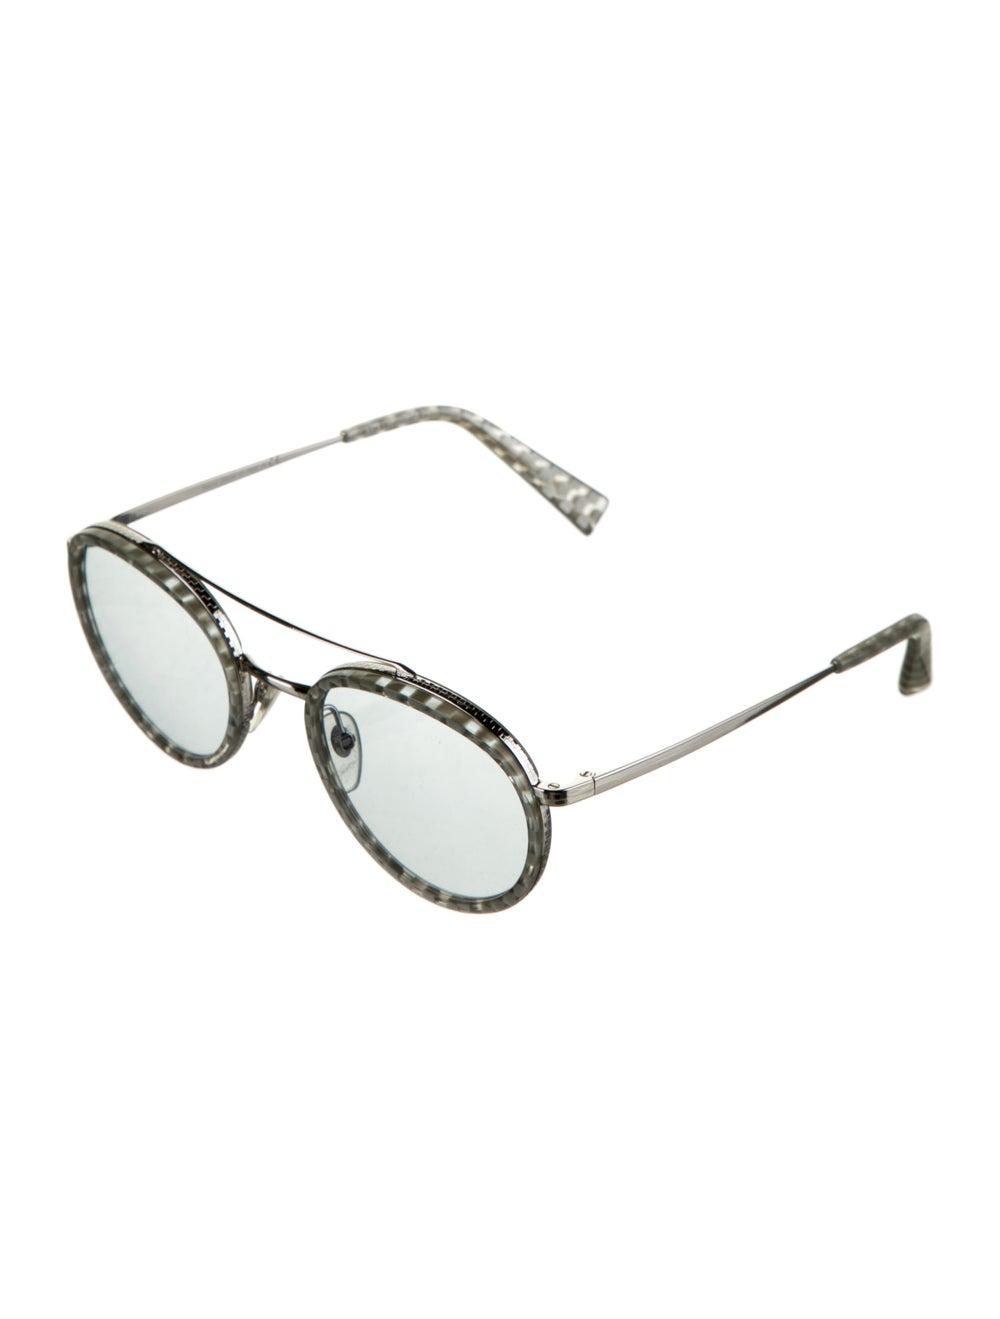 Alain Mikli Tinted Round Sunglasses Silver - image 2